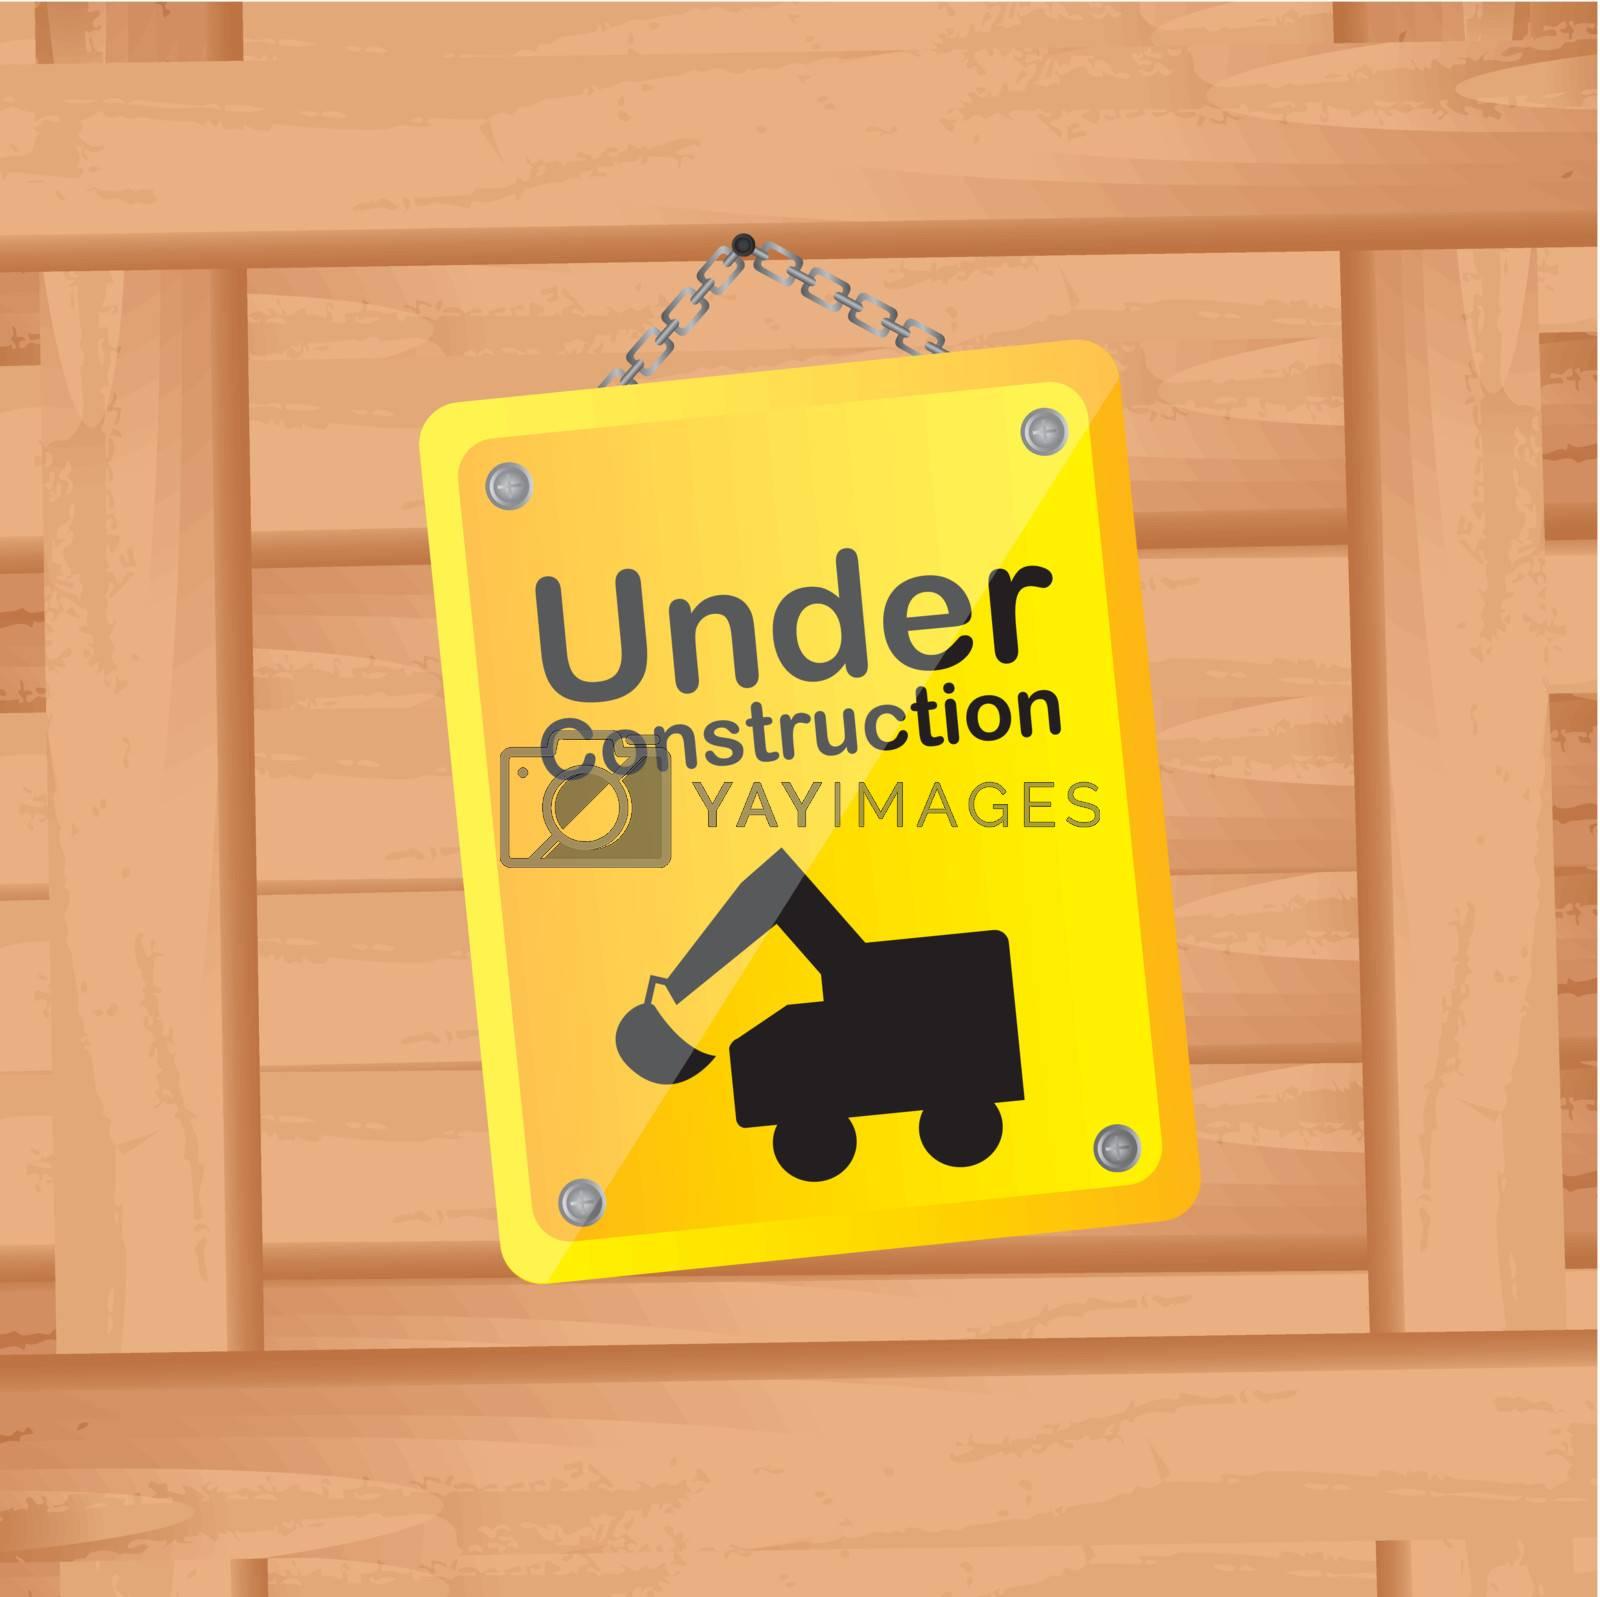 Under construction by yupiramos